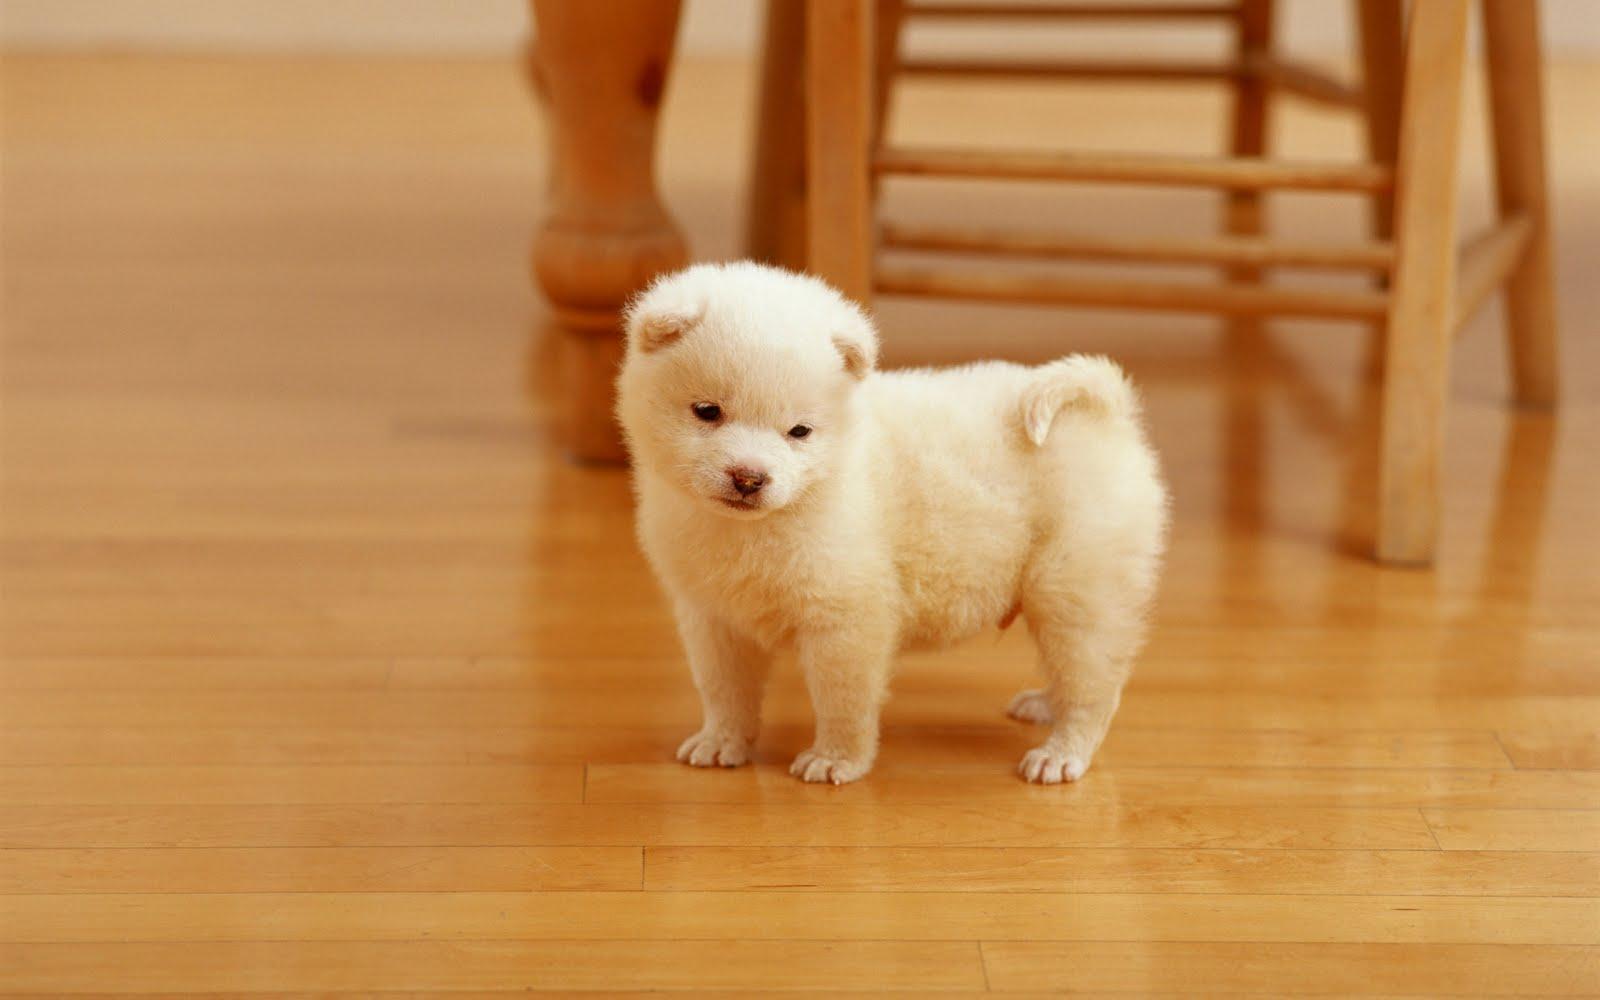 Un cachorro muy tierno - Lovely puppy (Wallpaper de 1920x1200)